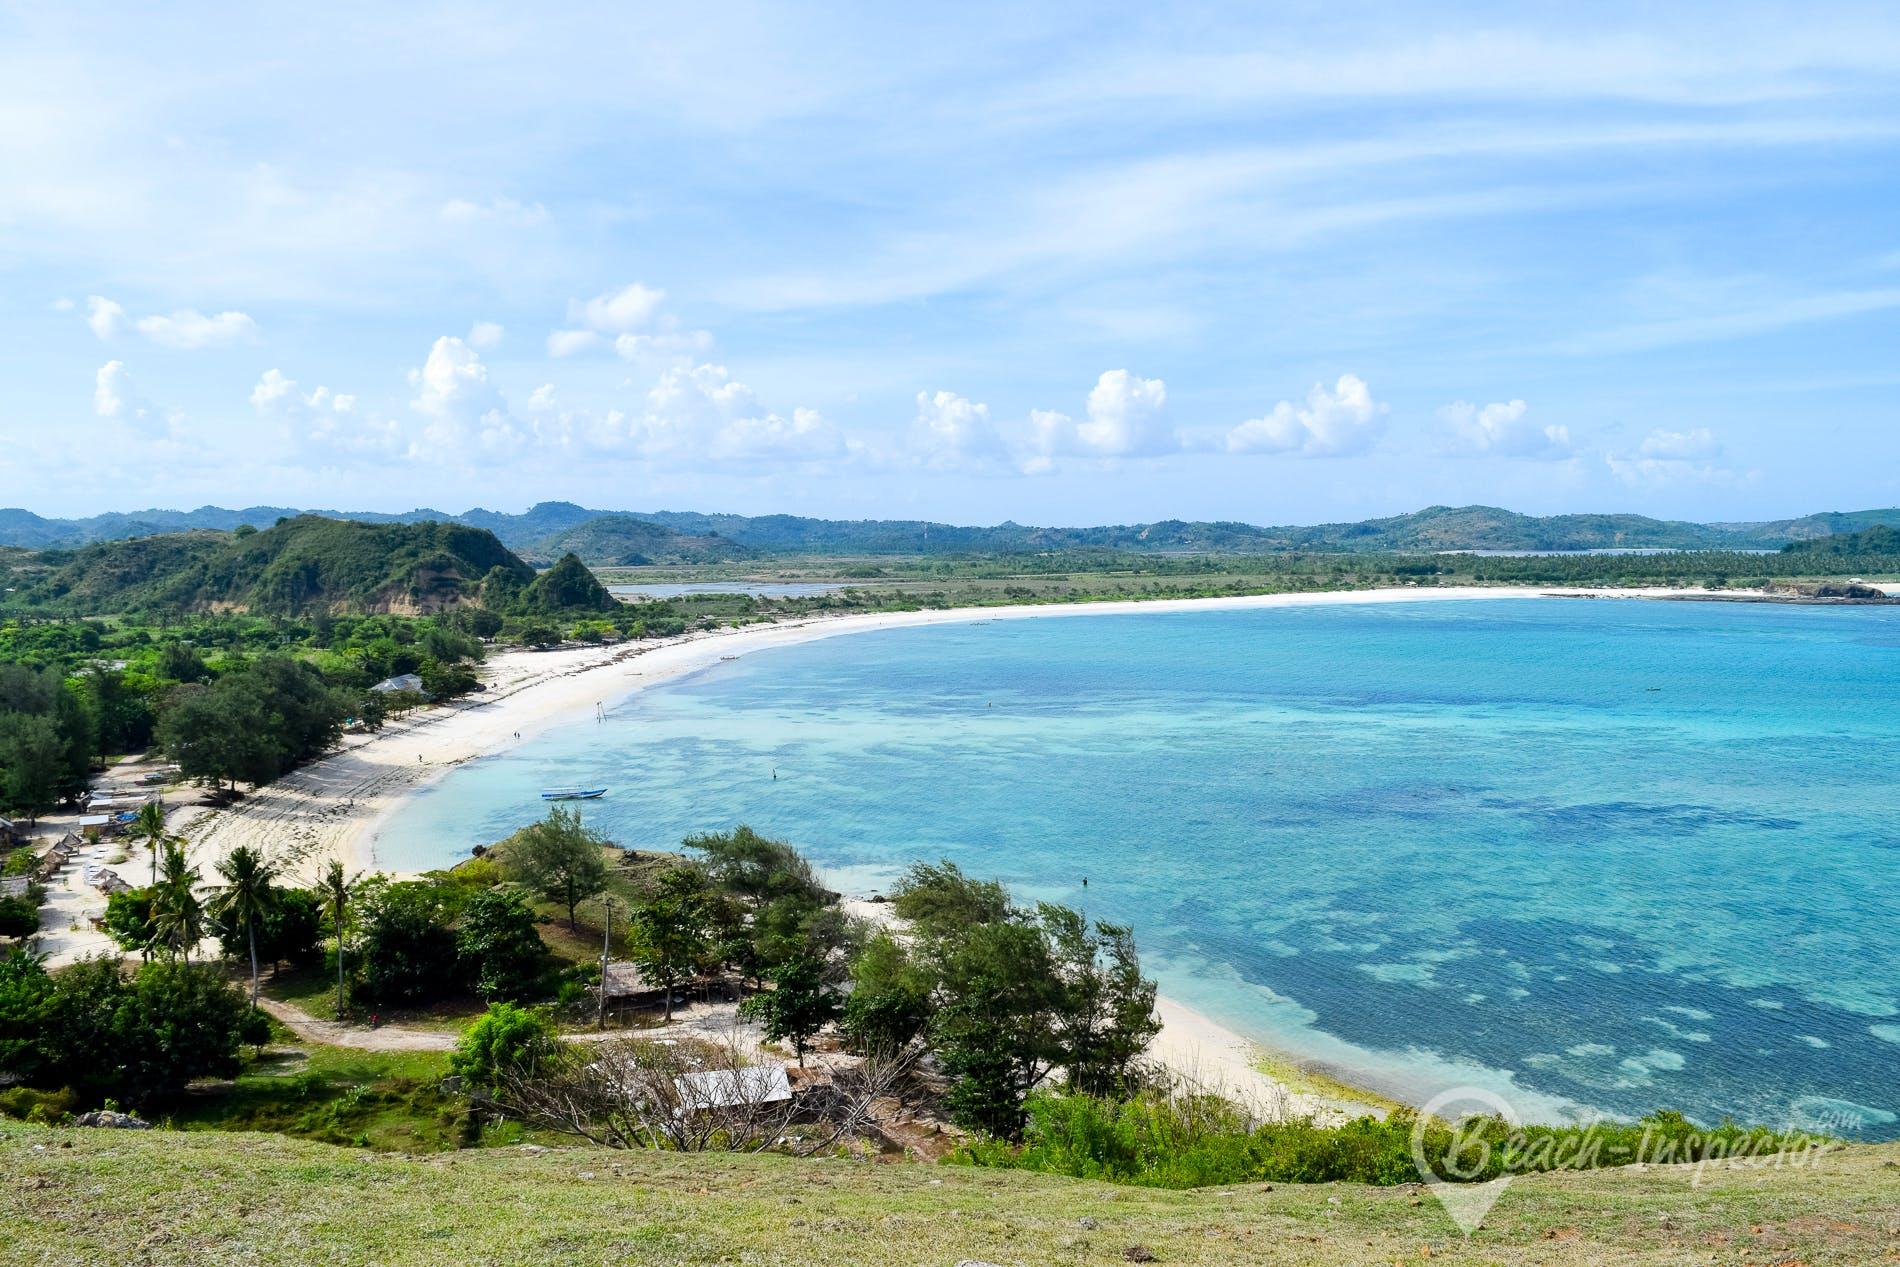 Beach Tanjung Aan Beach, Lombok, Indonesia